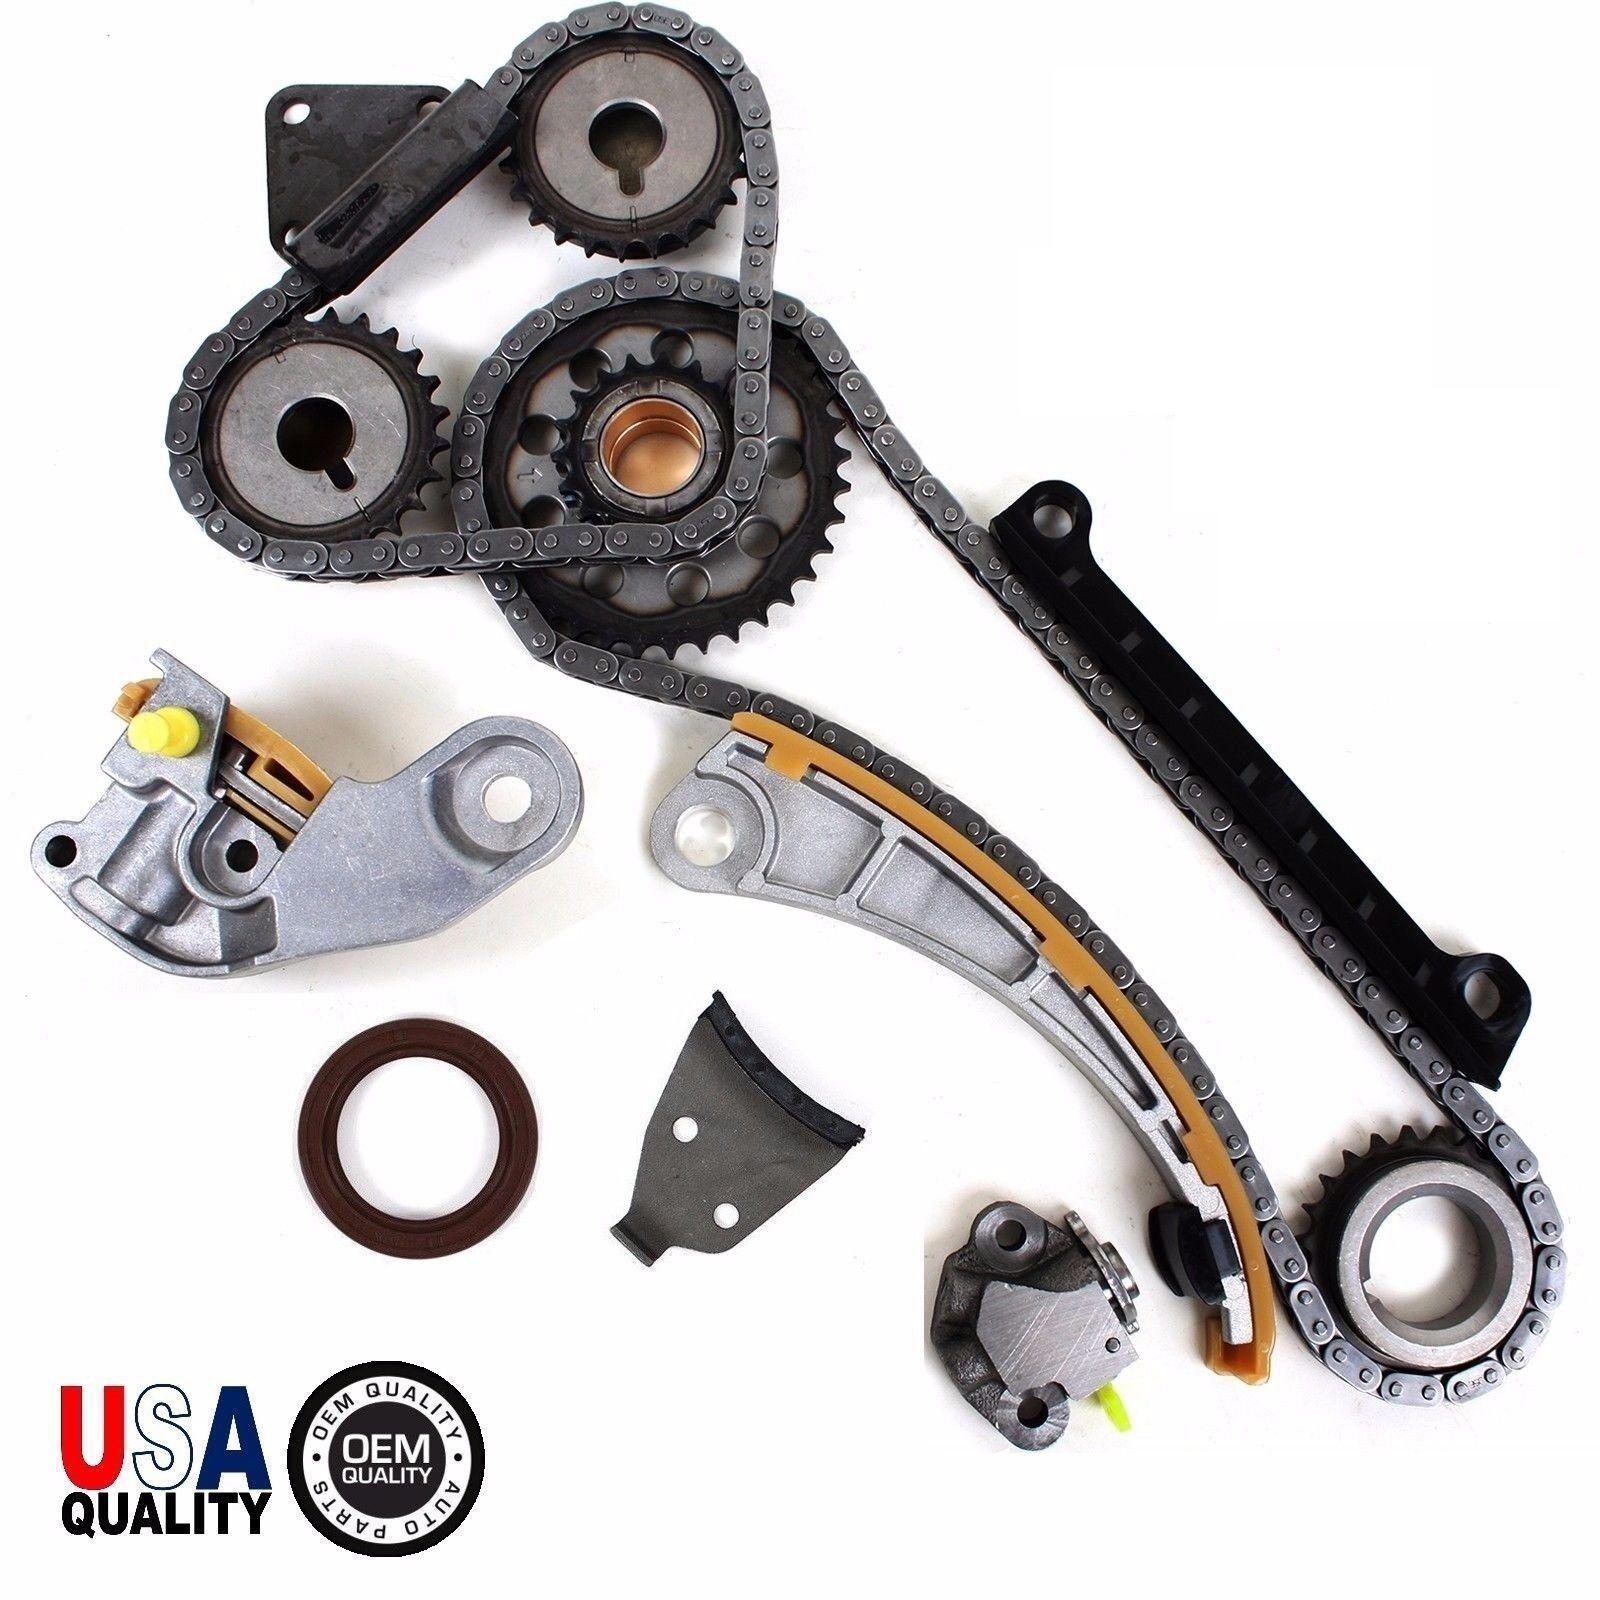 Timing Chain Kit Usa Suzuki Esteem Baleno Aerio J18 J20 J23 Ebay Engine